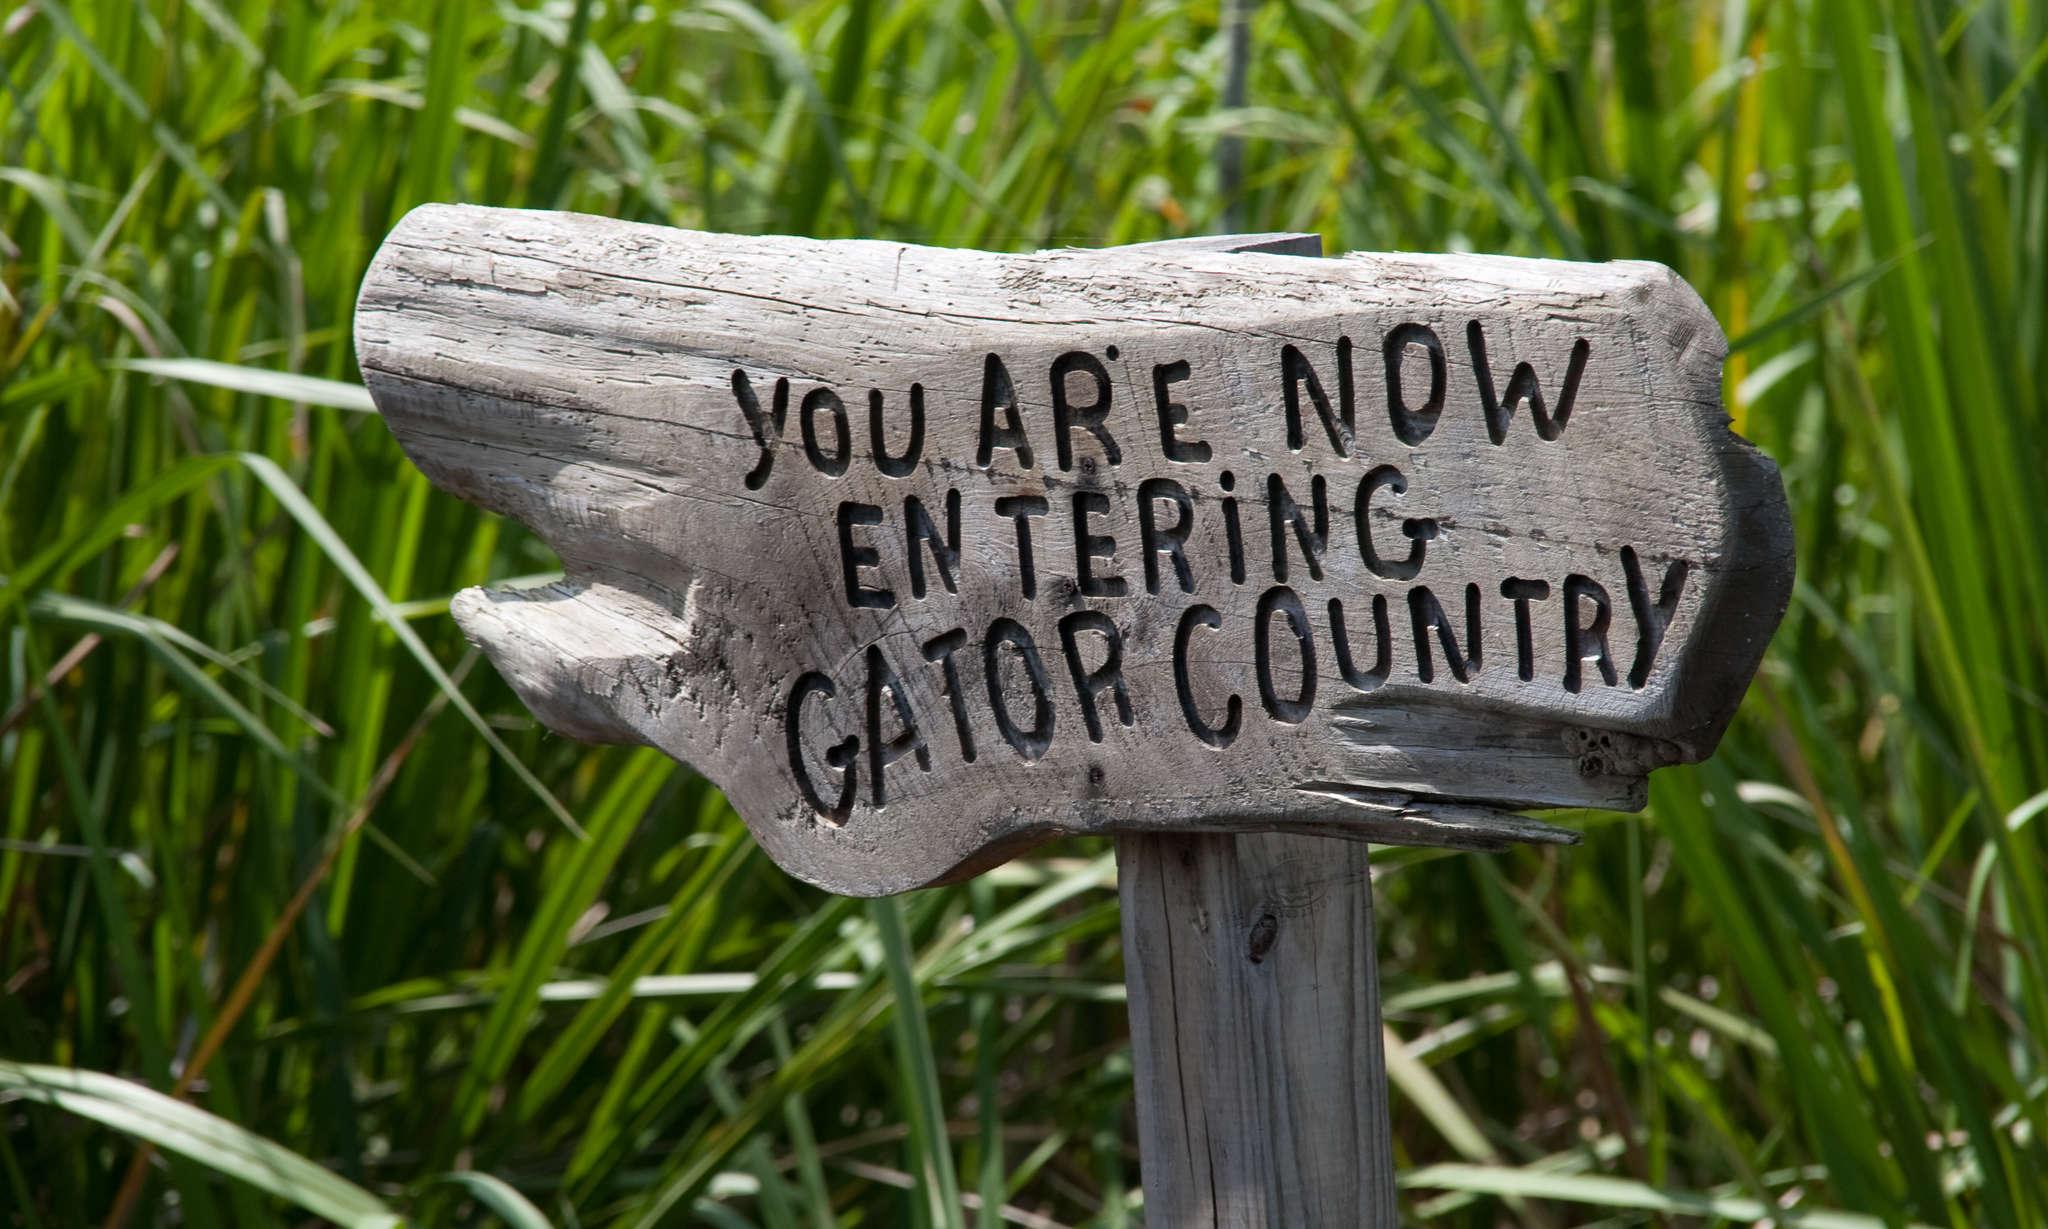 Explore the Swamp